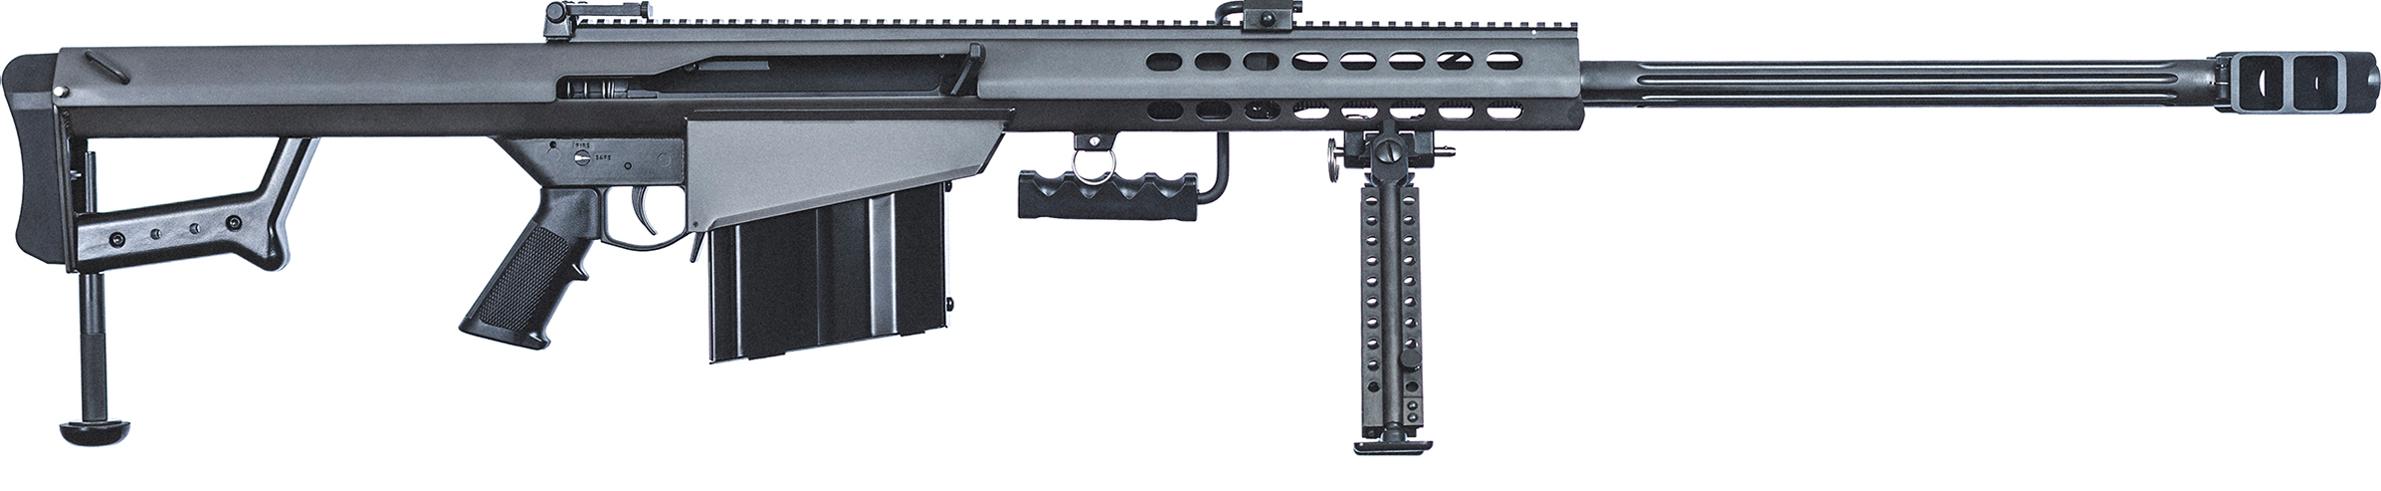 Rifle Barrett Calibre 50